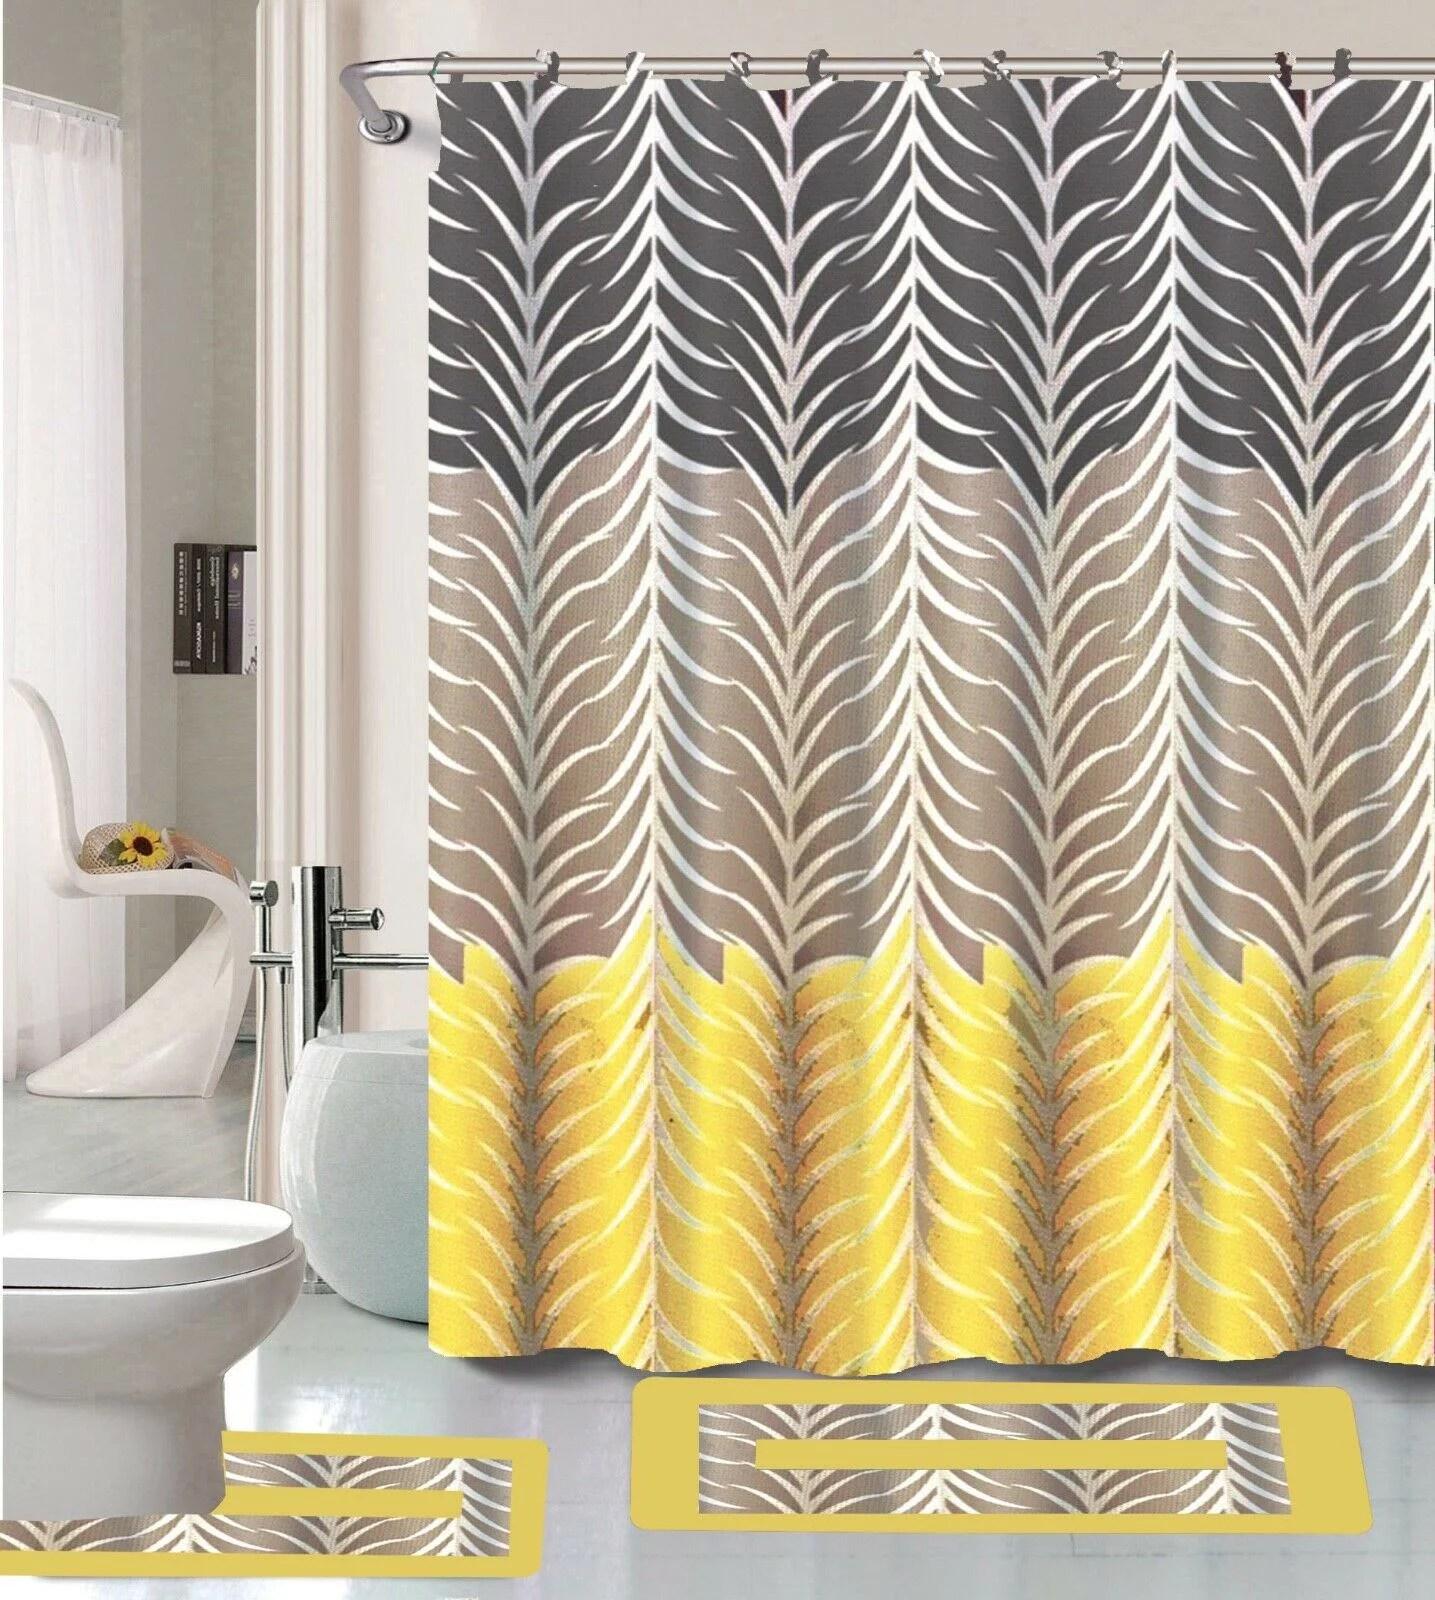 sonia yellow gray multi tone 15 piece bathroom accessory set 2 bath mats shower curtain 12 fabric covered rings